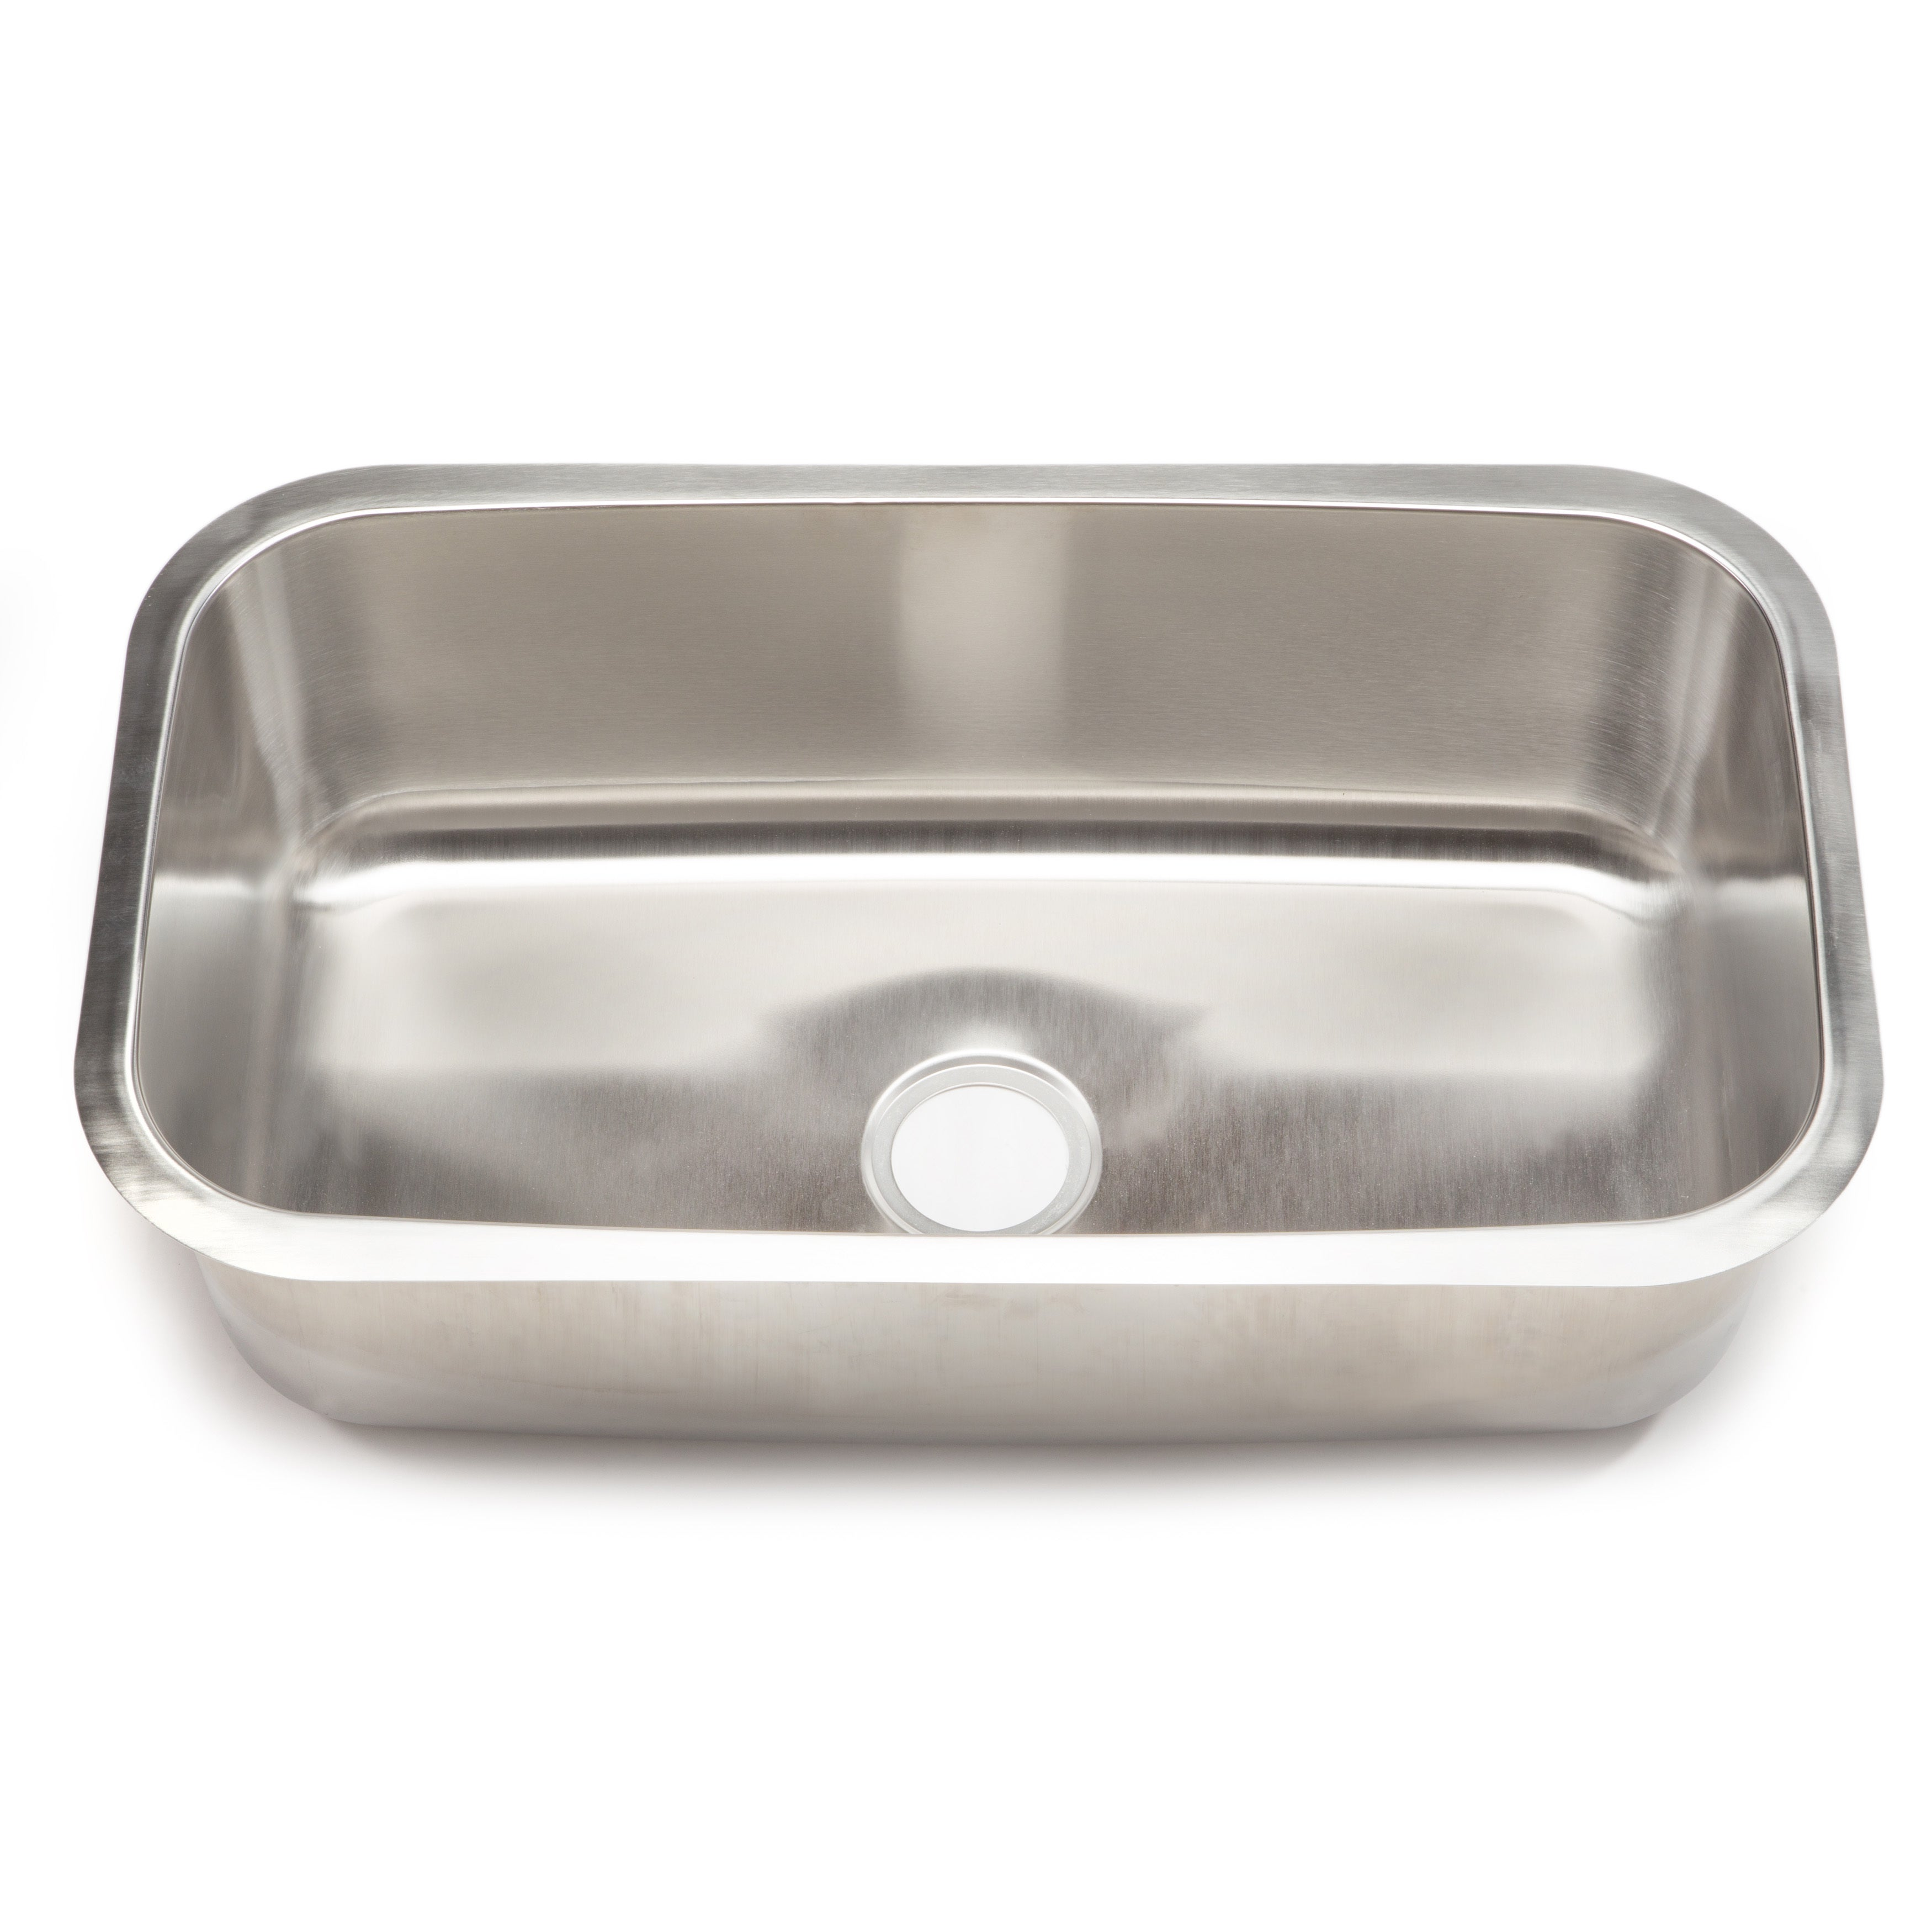 Clark Stainless Steel Extra Large Single-bowl Undermount Kitchen ...